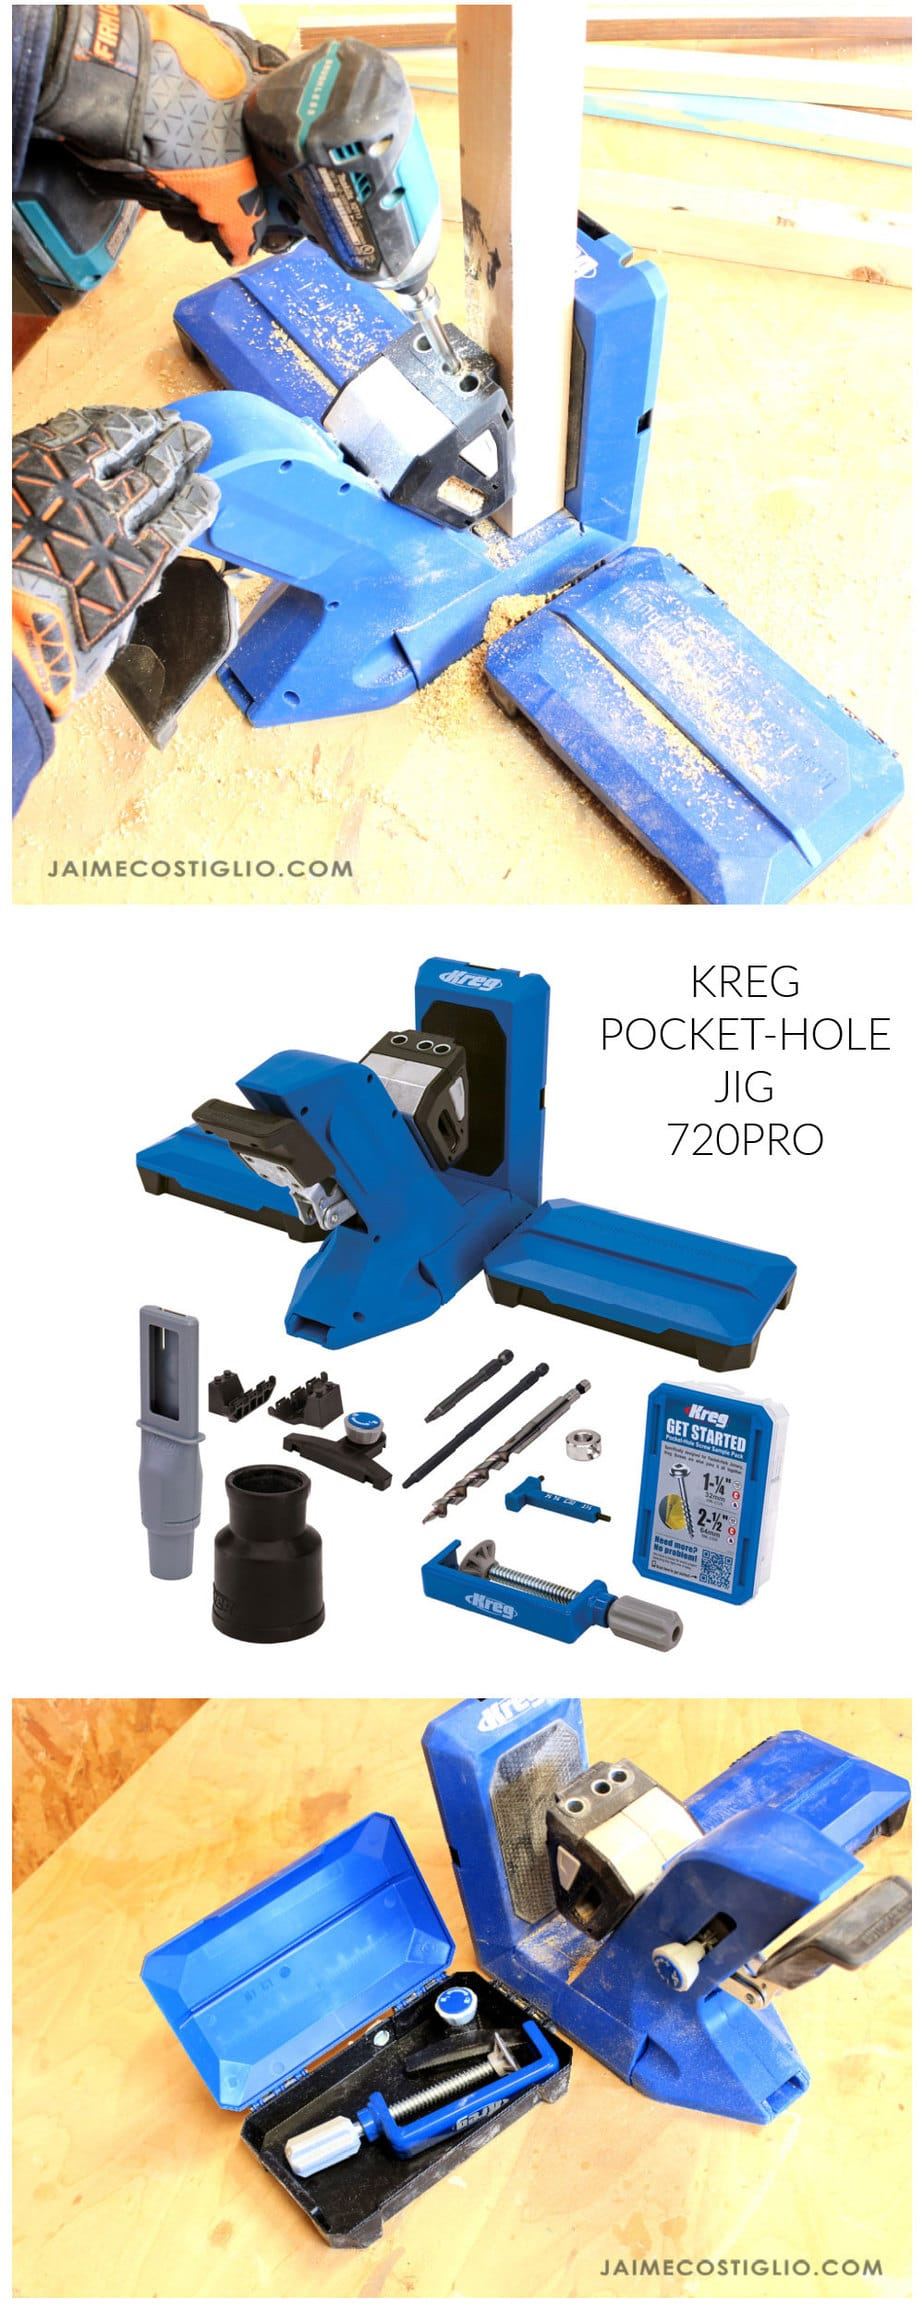 kreg pocket hole jig 720pro collage